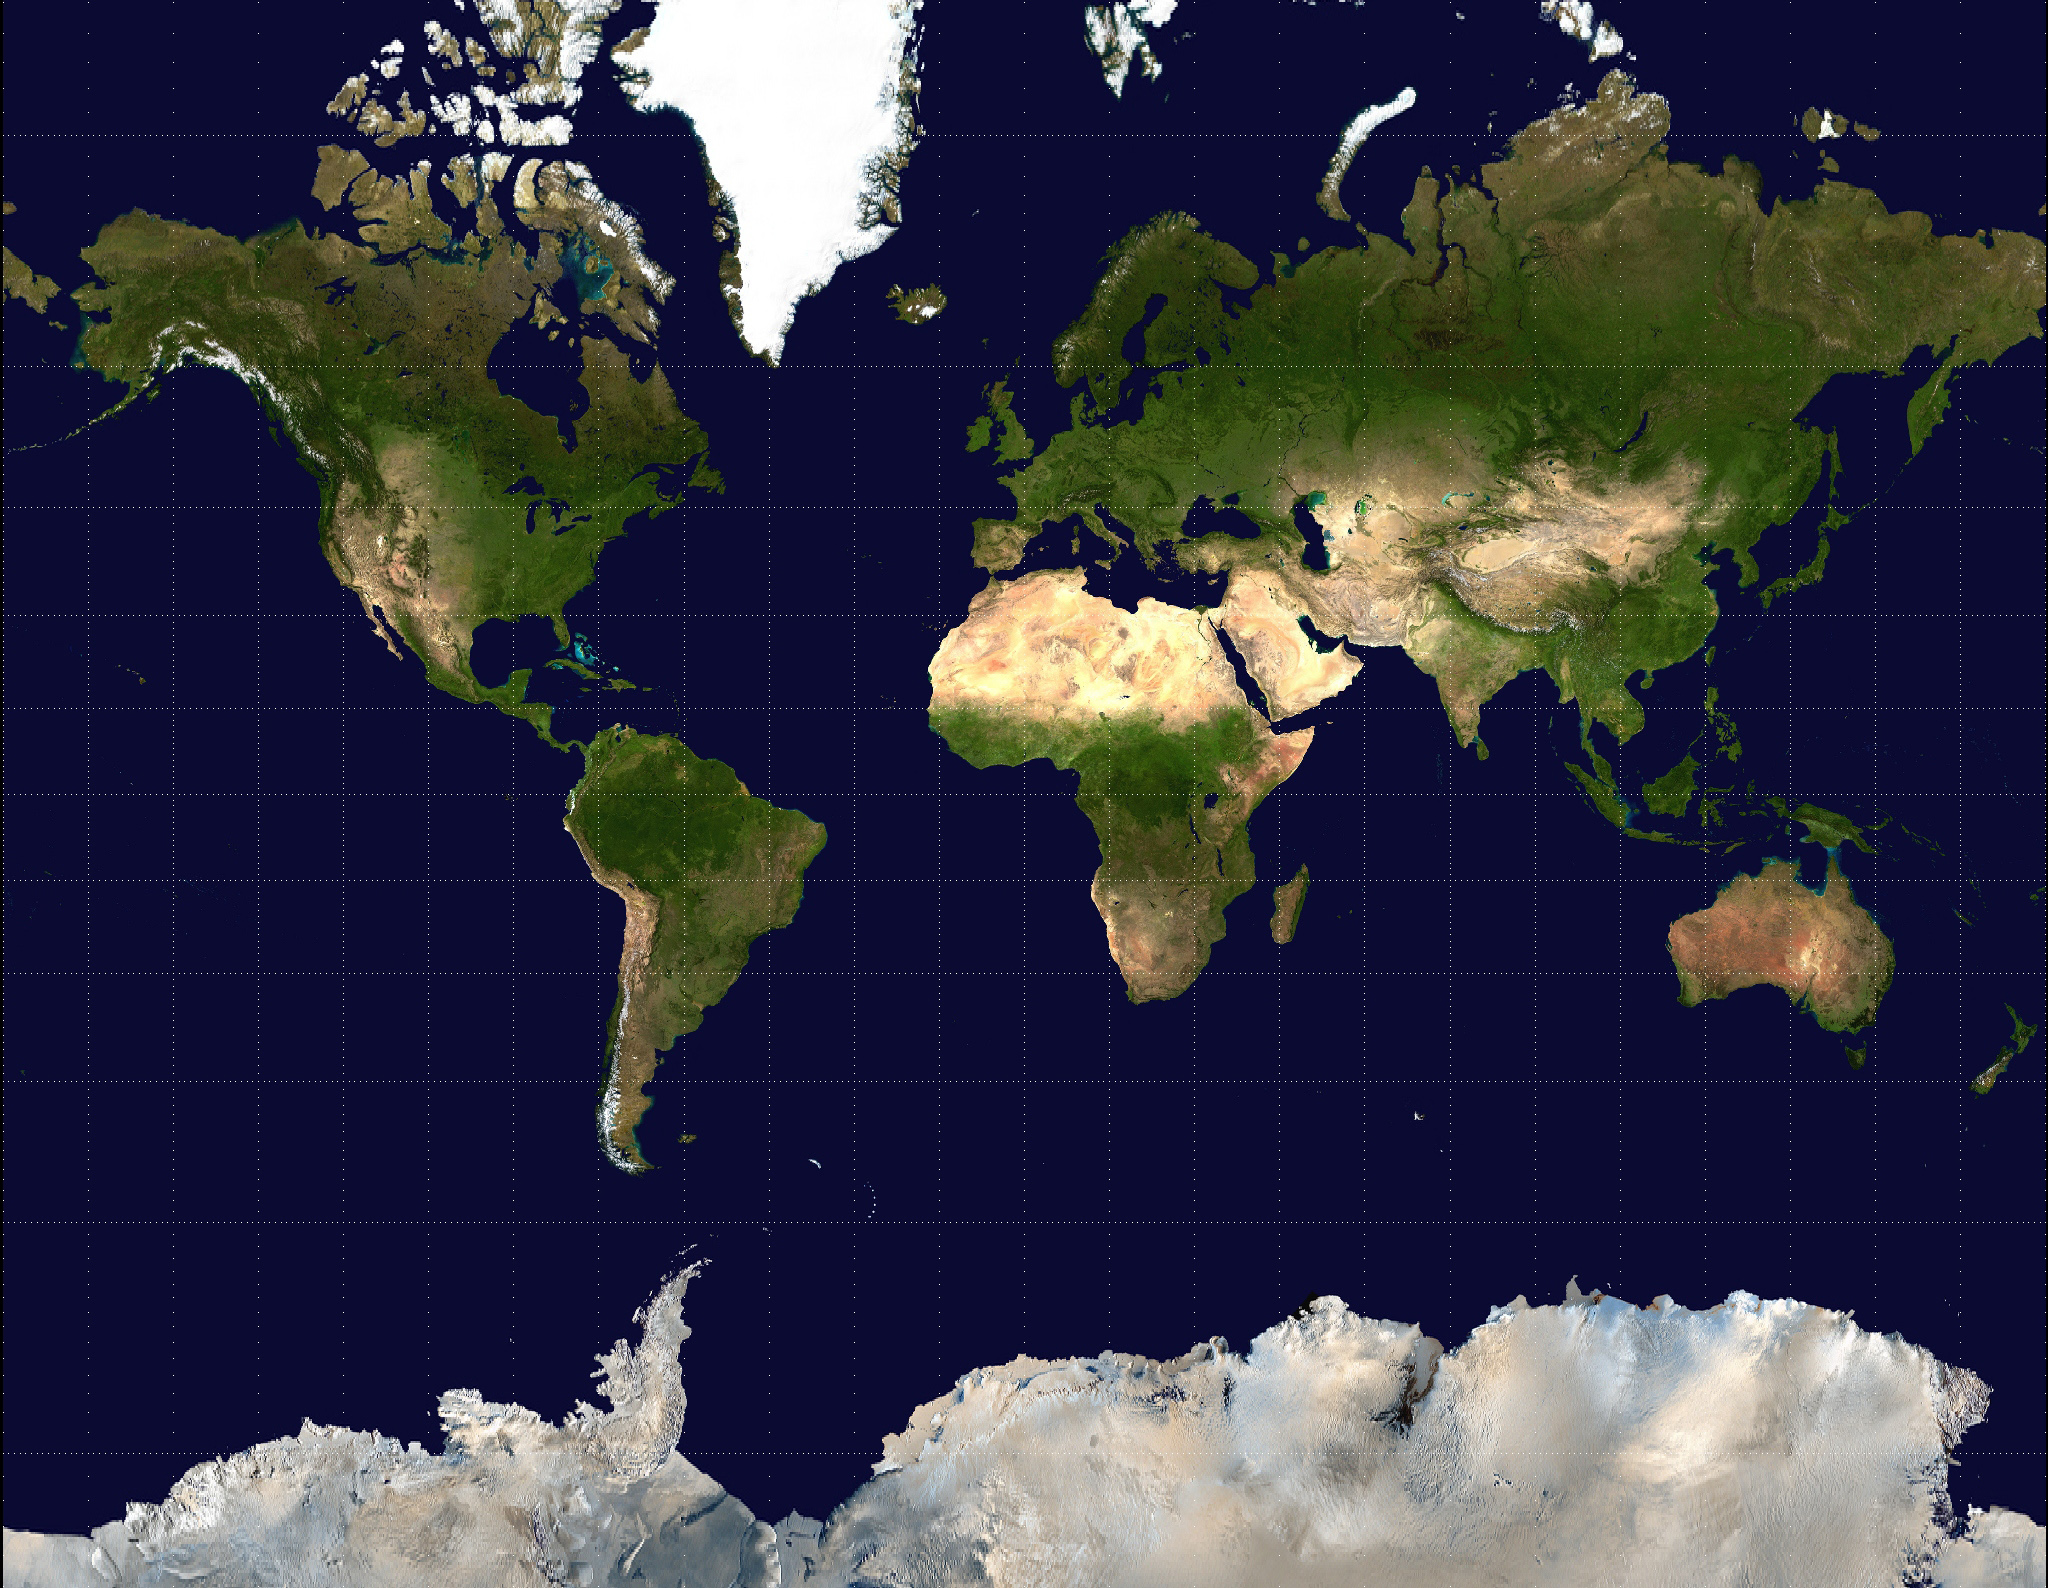 Large Satellite Map Of The World World Mapsland Maps Of The - World map from satellite